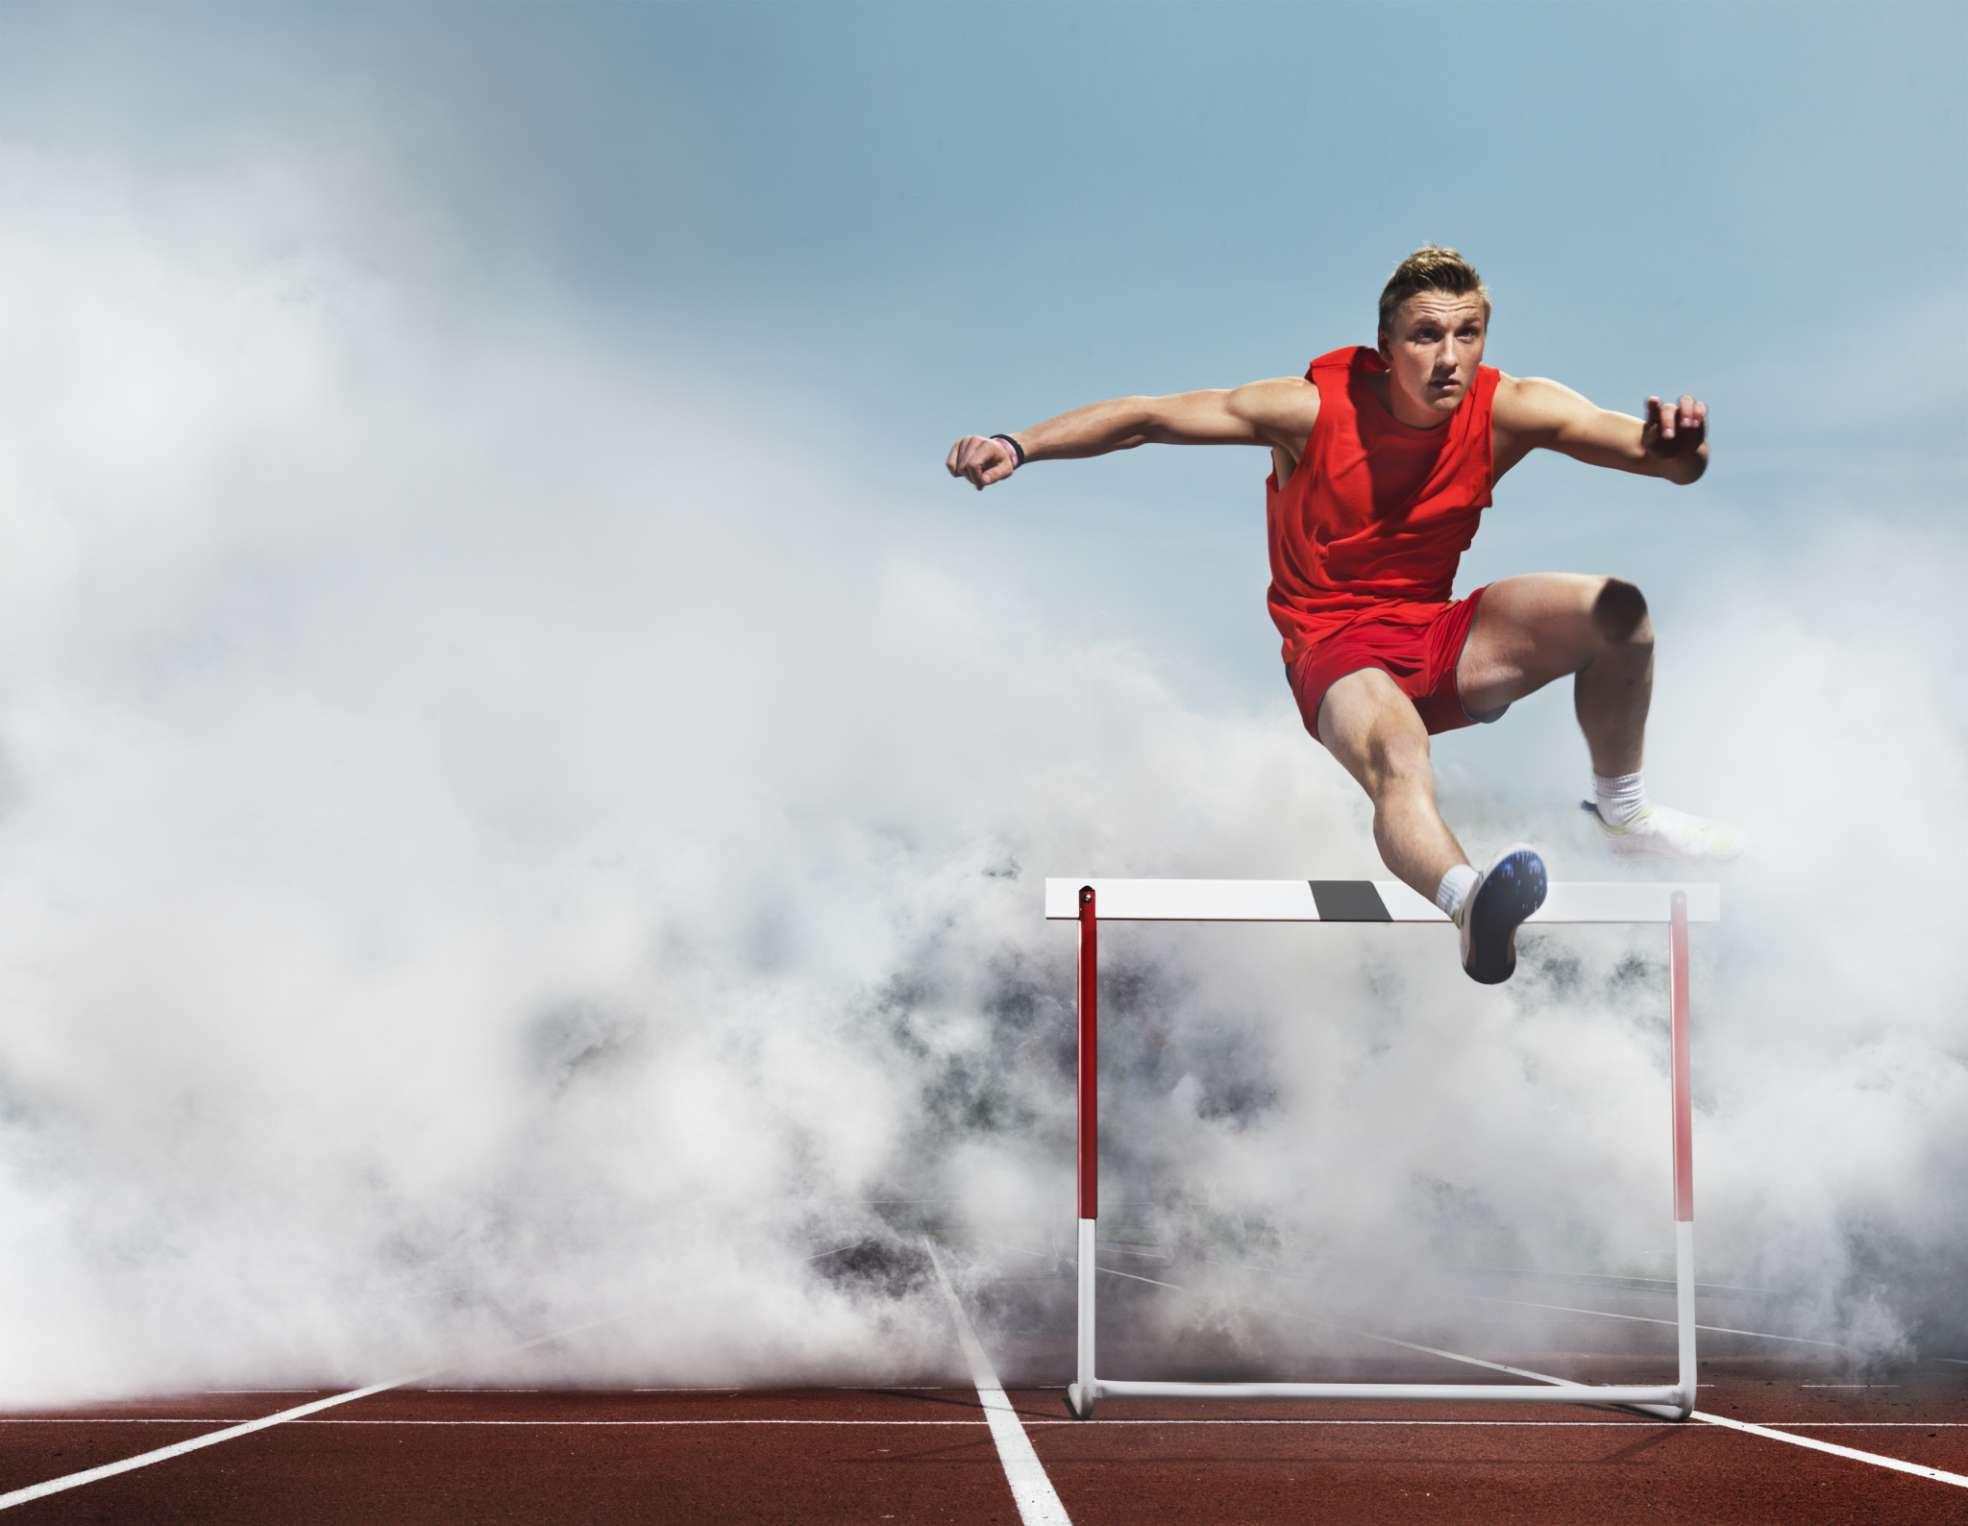 Young athlete hurdling